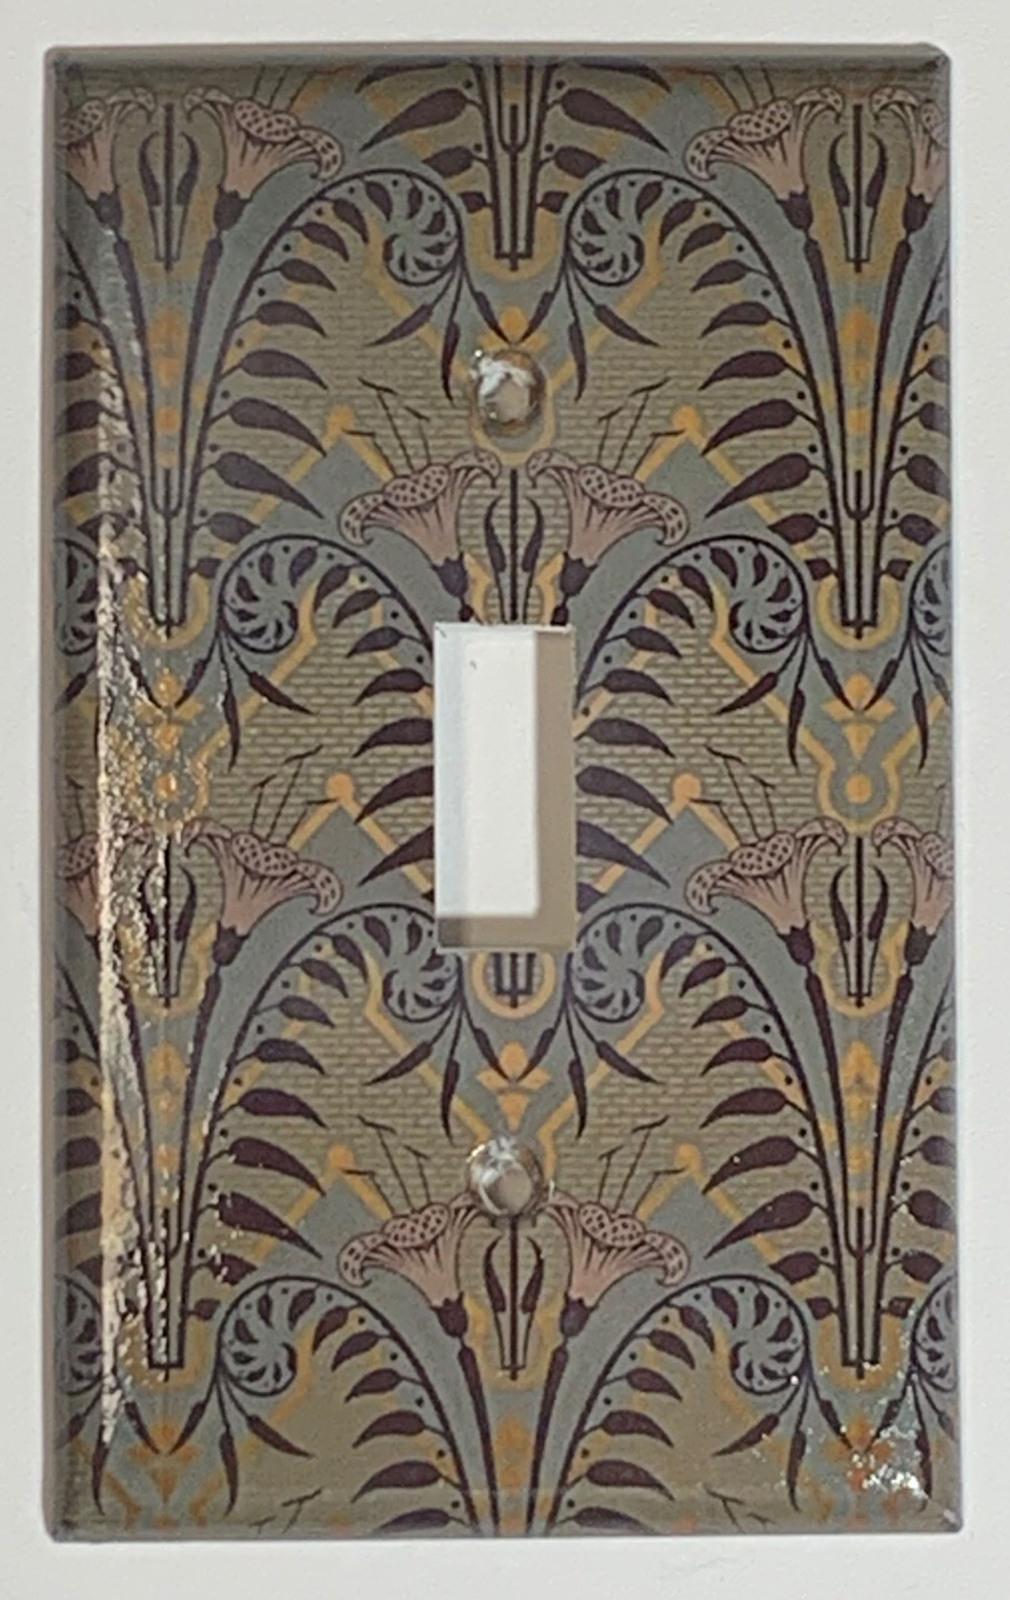 Haunted mansion wallpaper brown single toggle